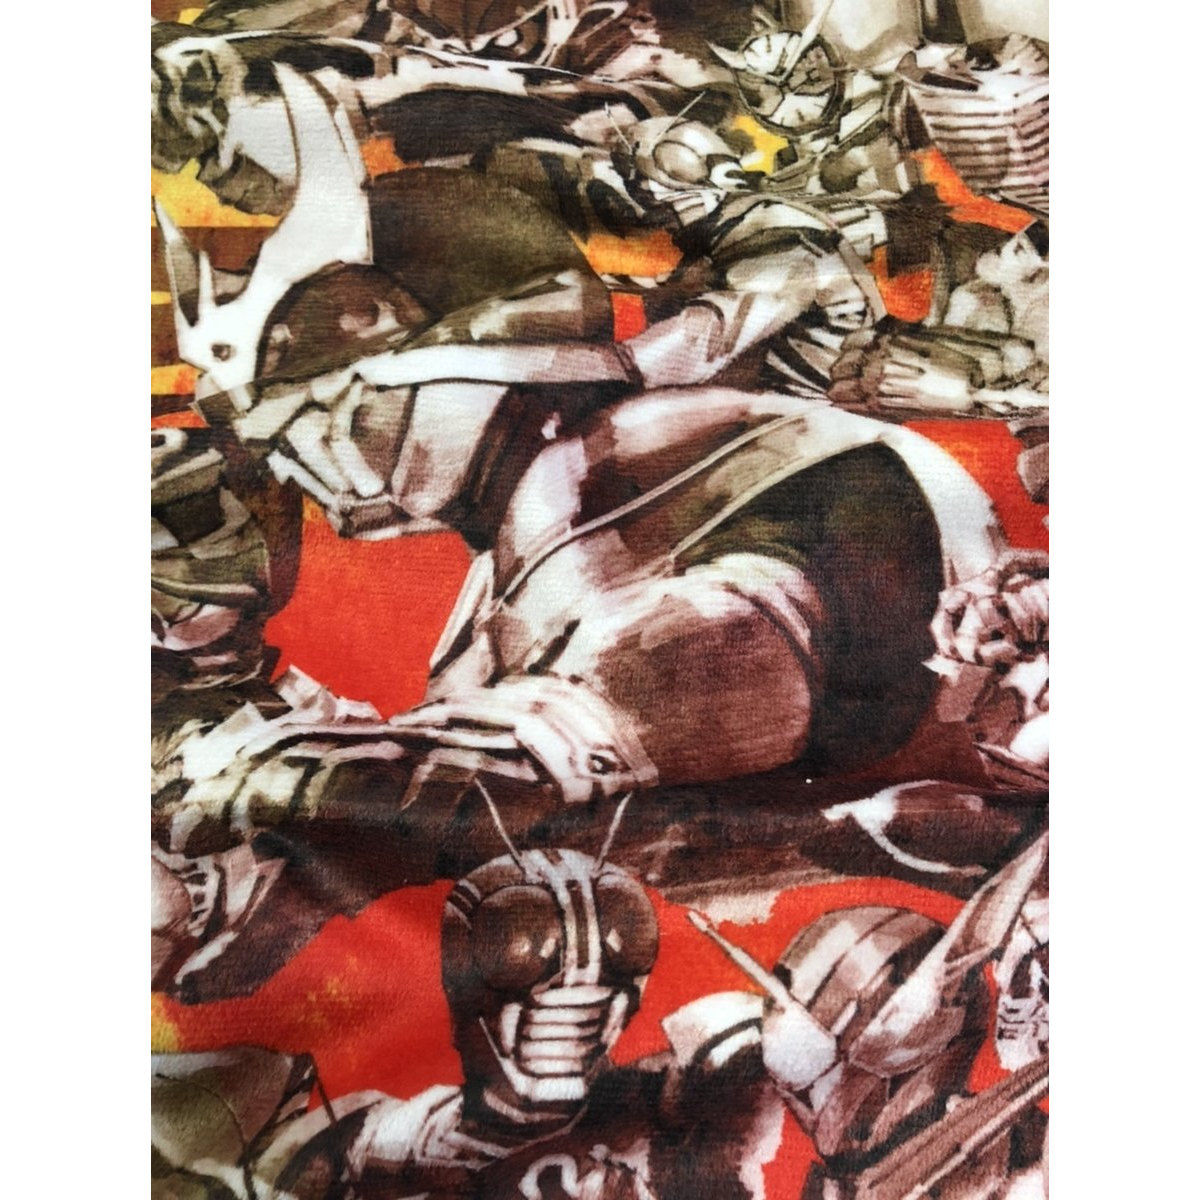 Kamen Rider 50th Anniversary Bath Towel